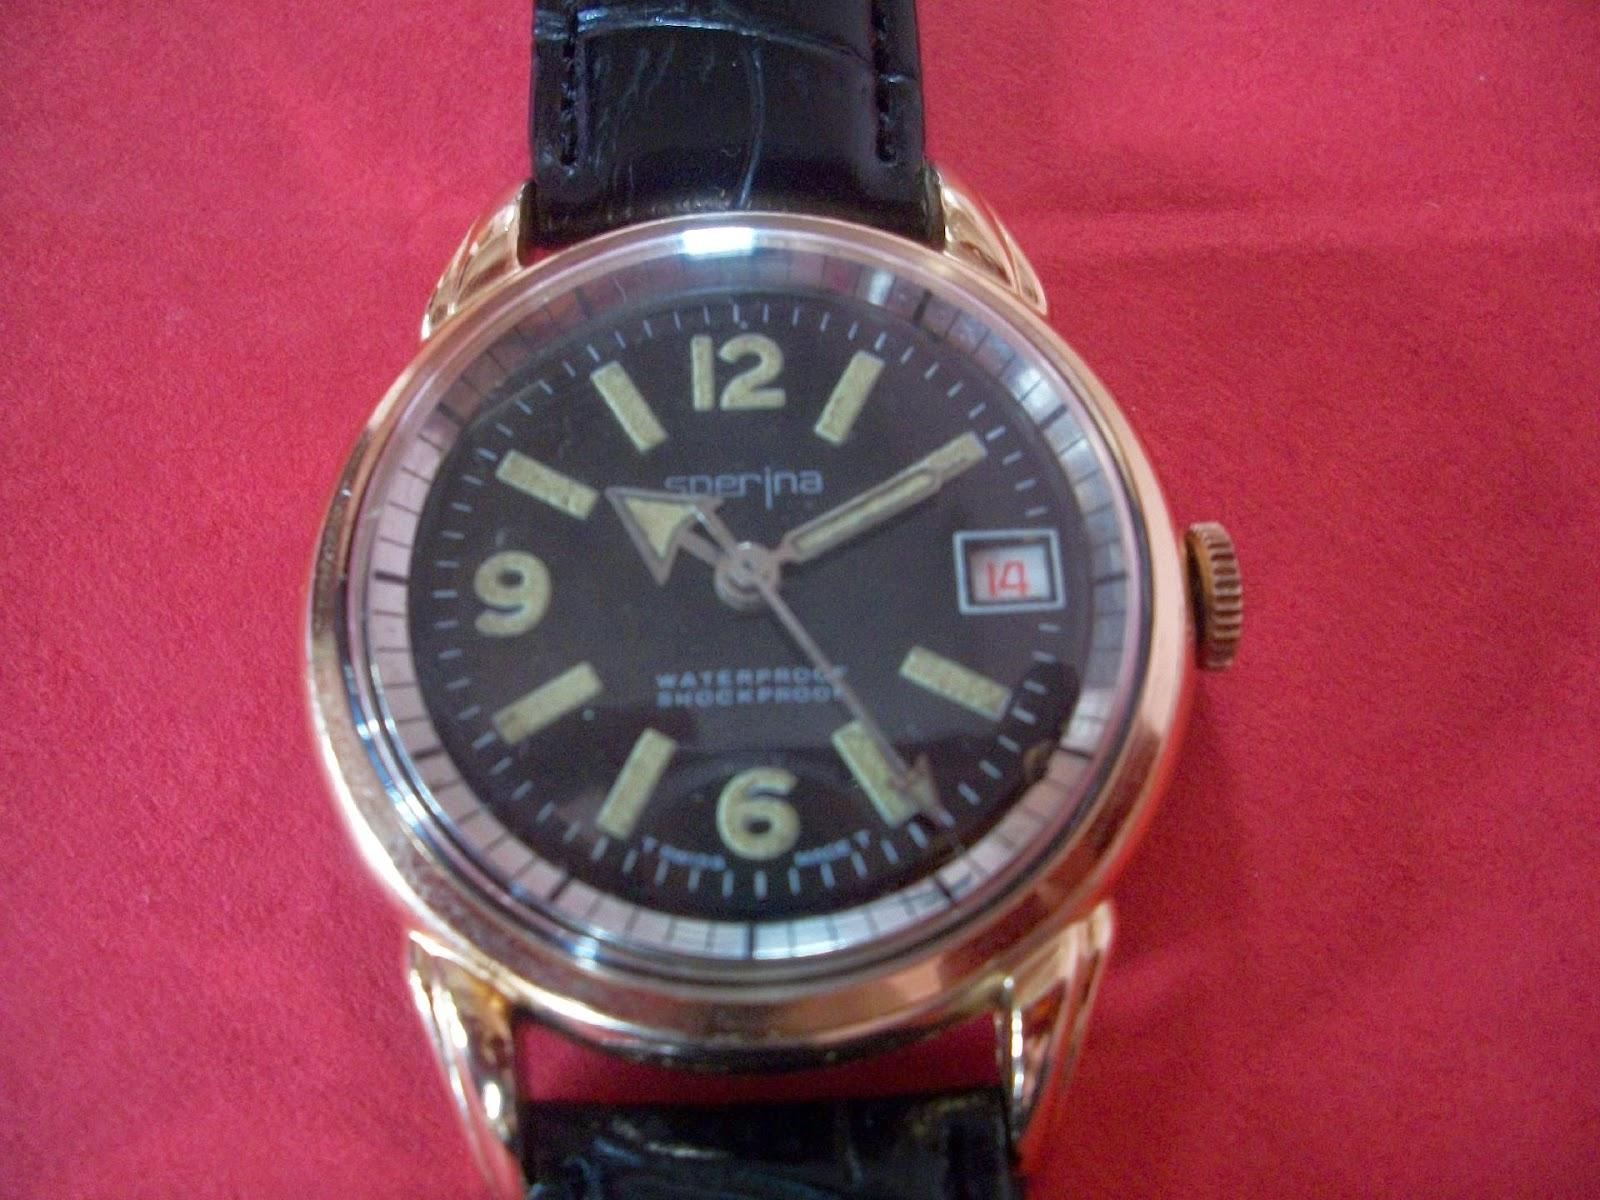 SPERINA WATCH Co. swiss made mechanical watch